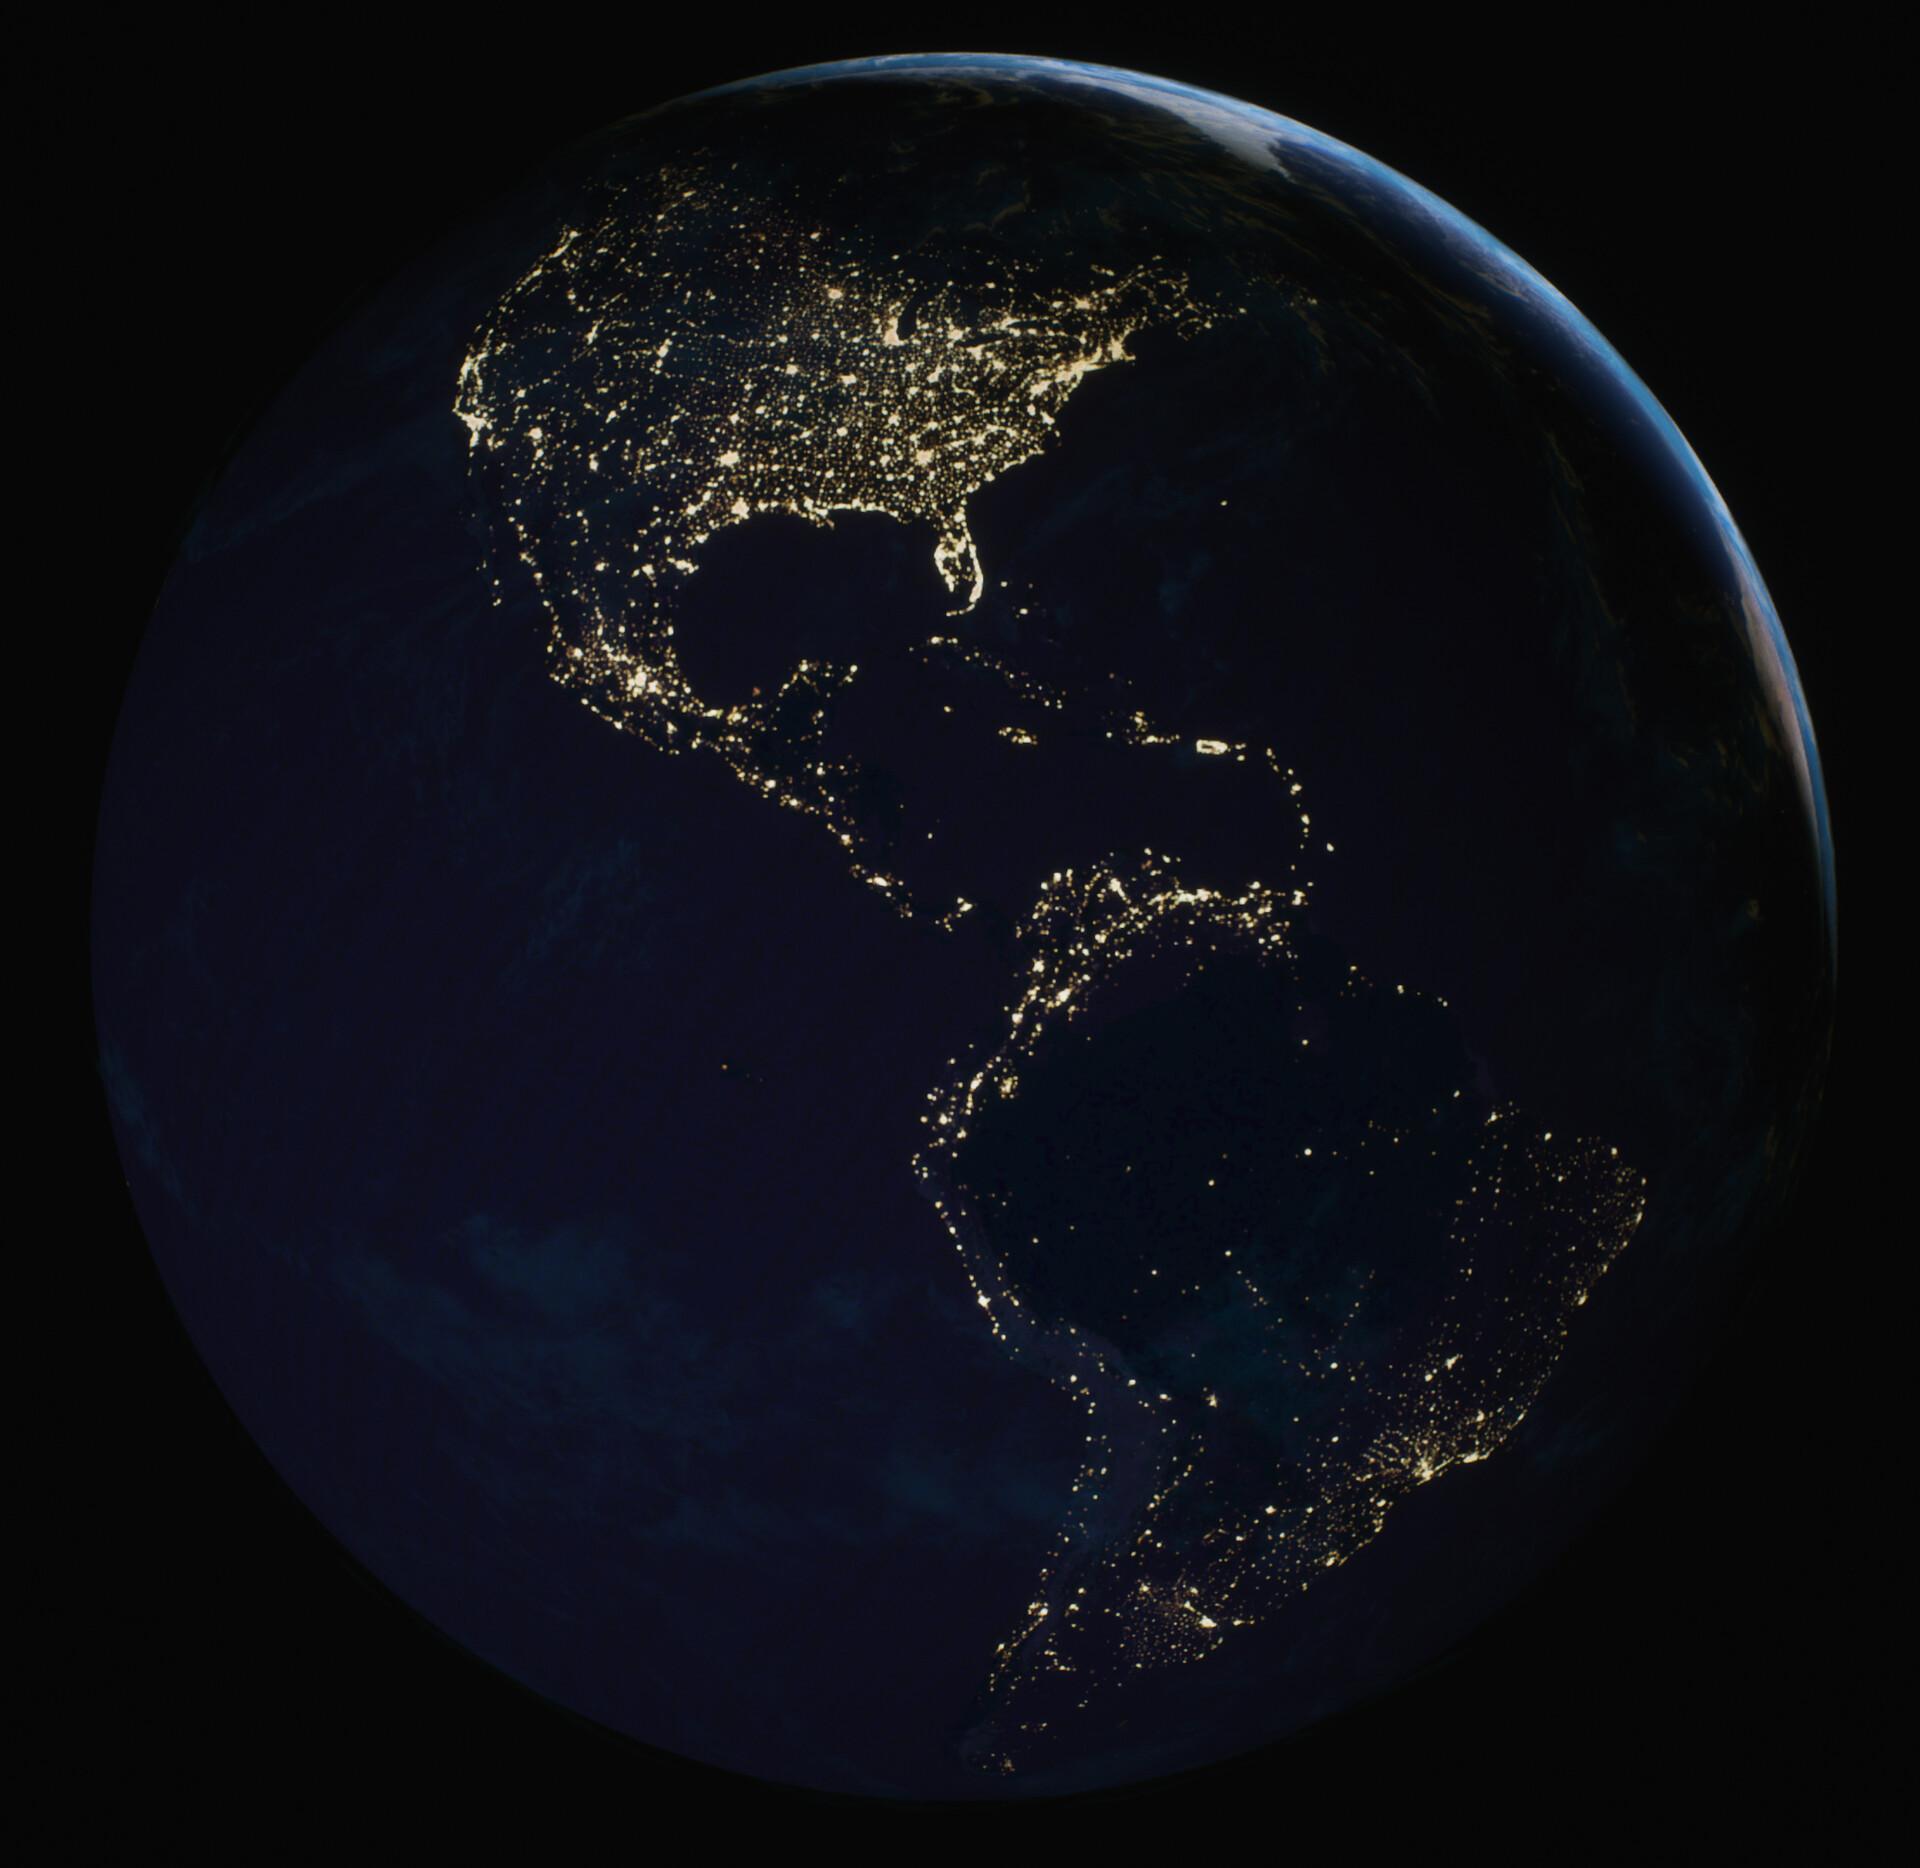 The Black Marble. Original Photo - https://images.nasa.gov/details-GSFC_20171208_Archive_e001587.html